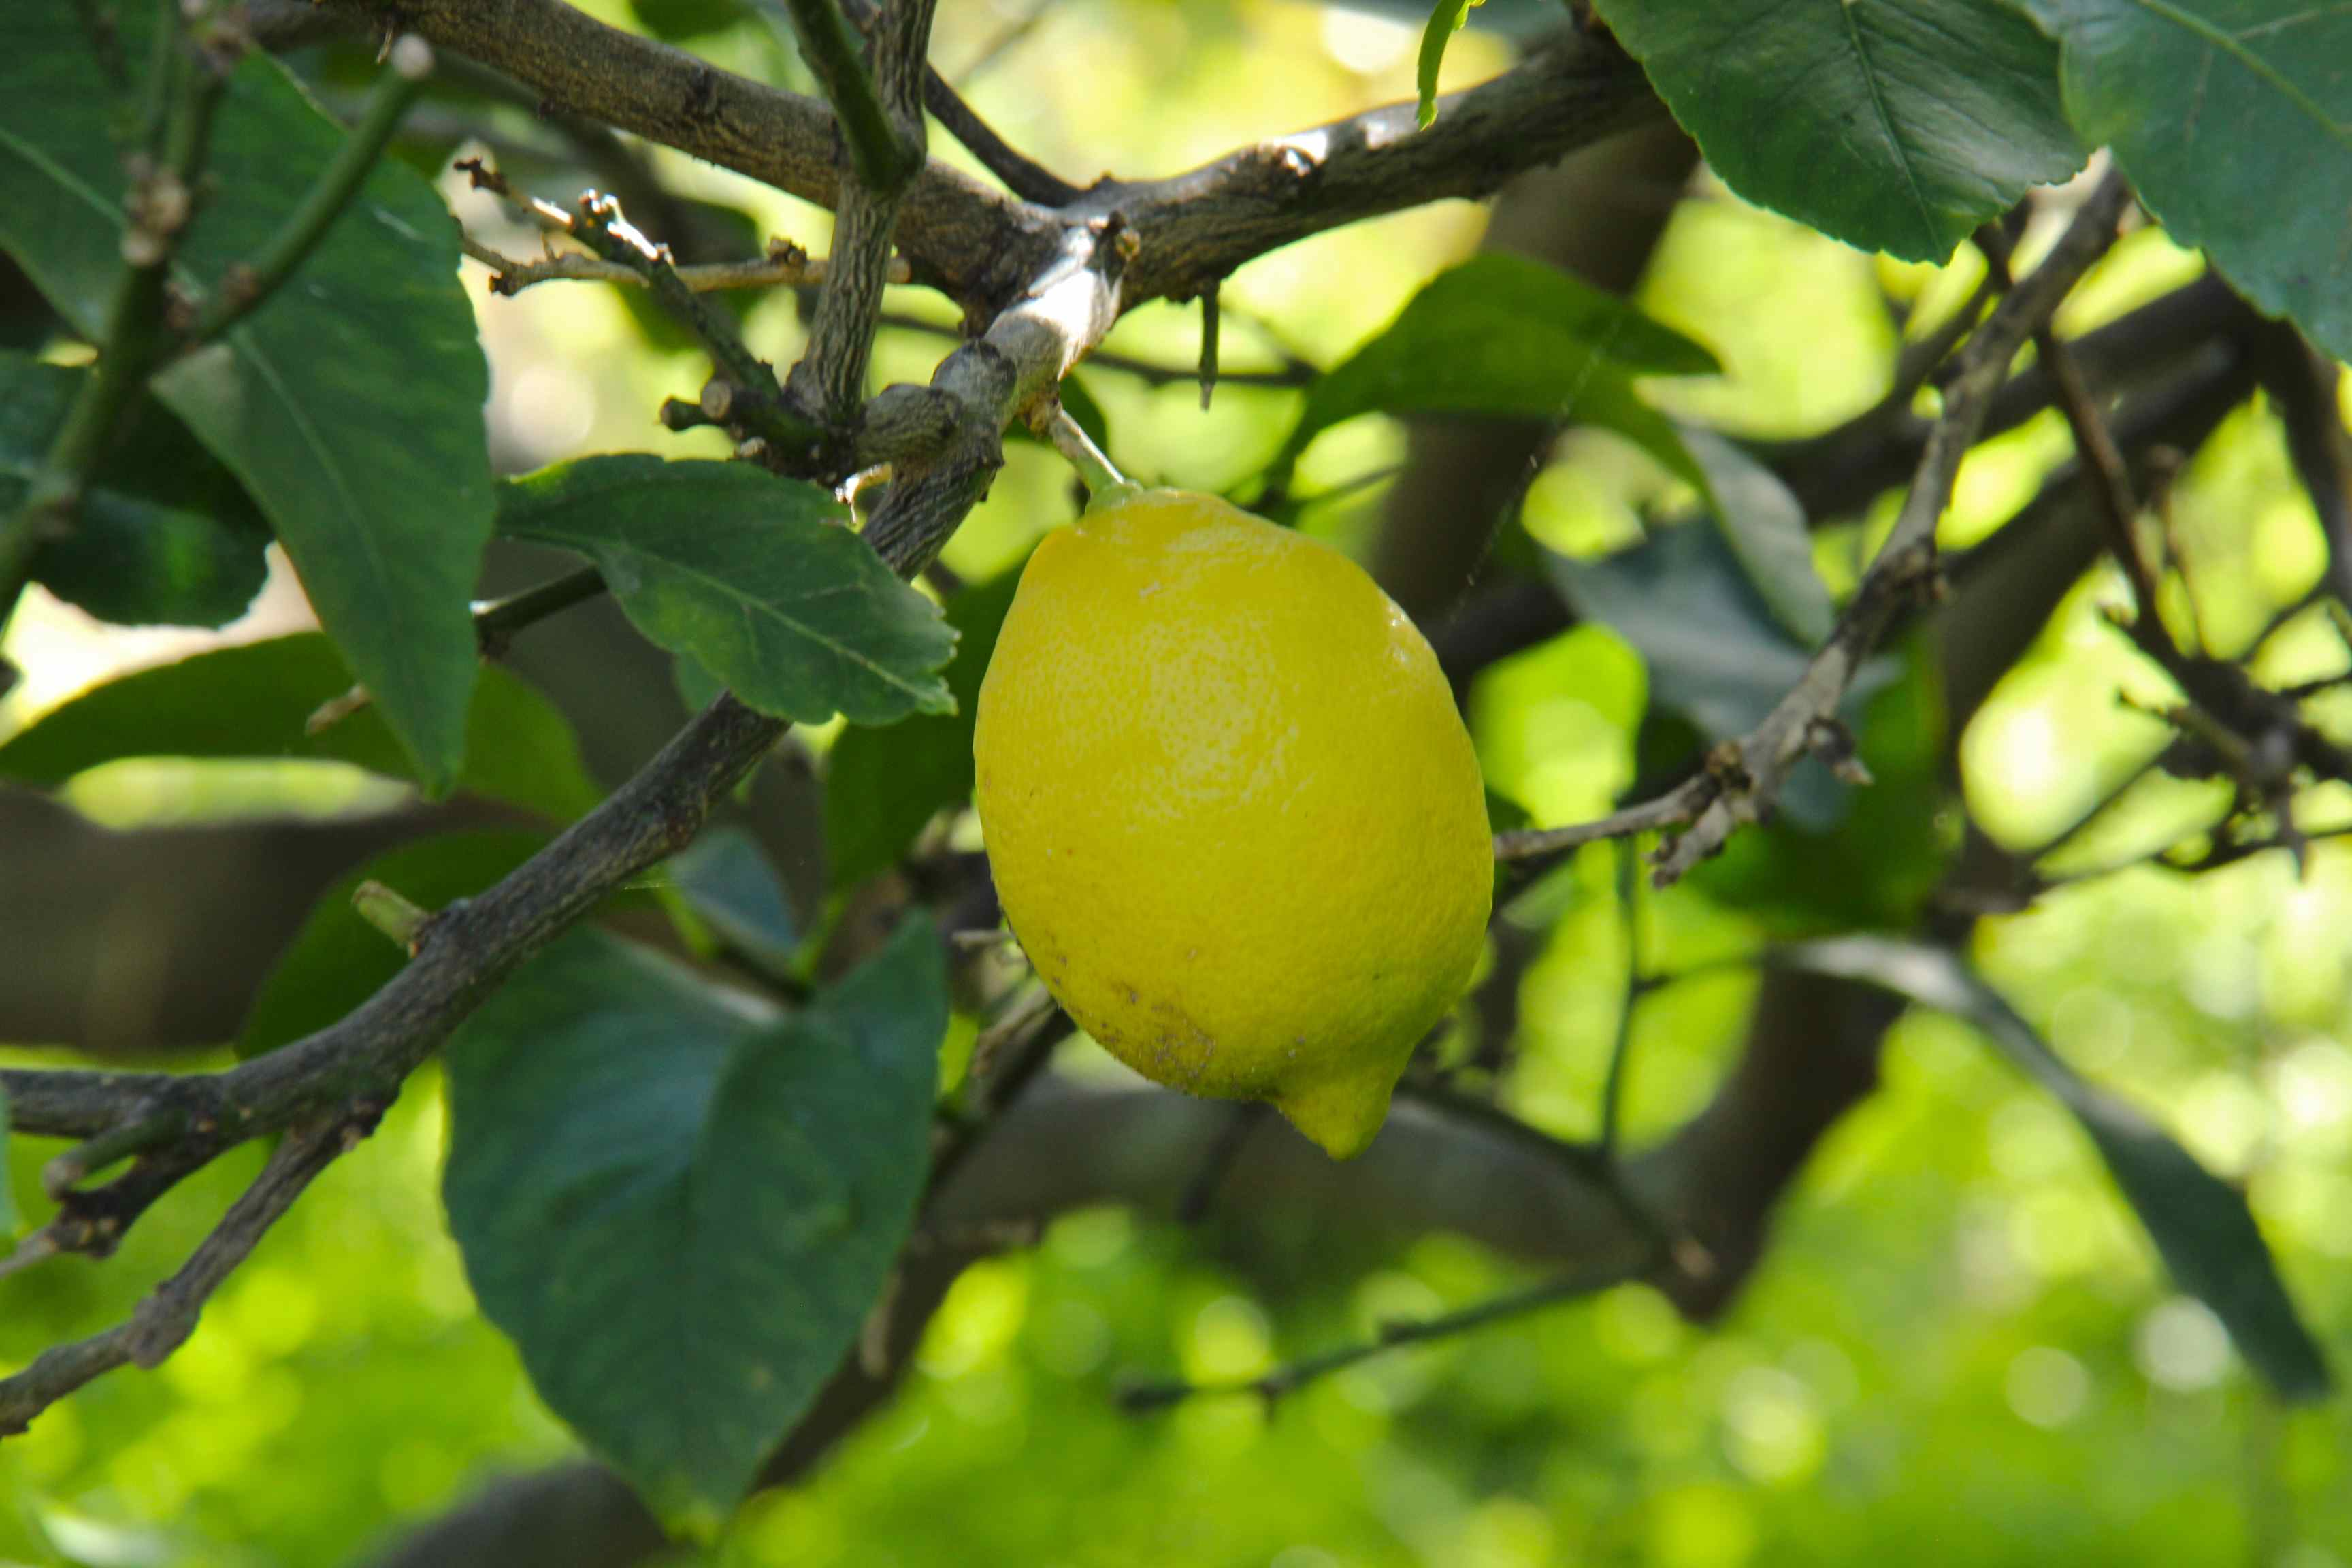 Citrons de Jean-Noël Falcou